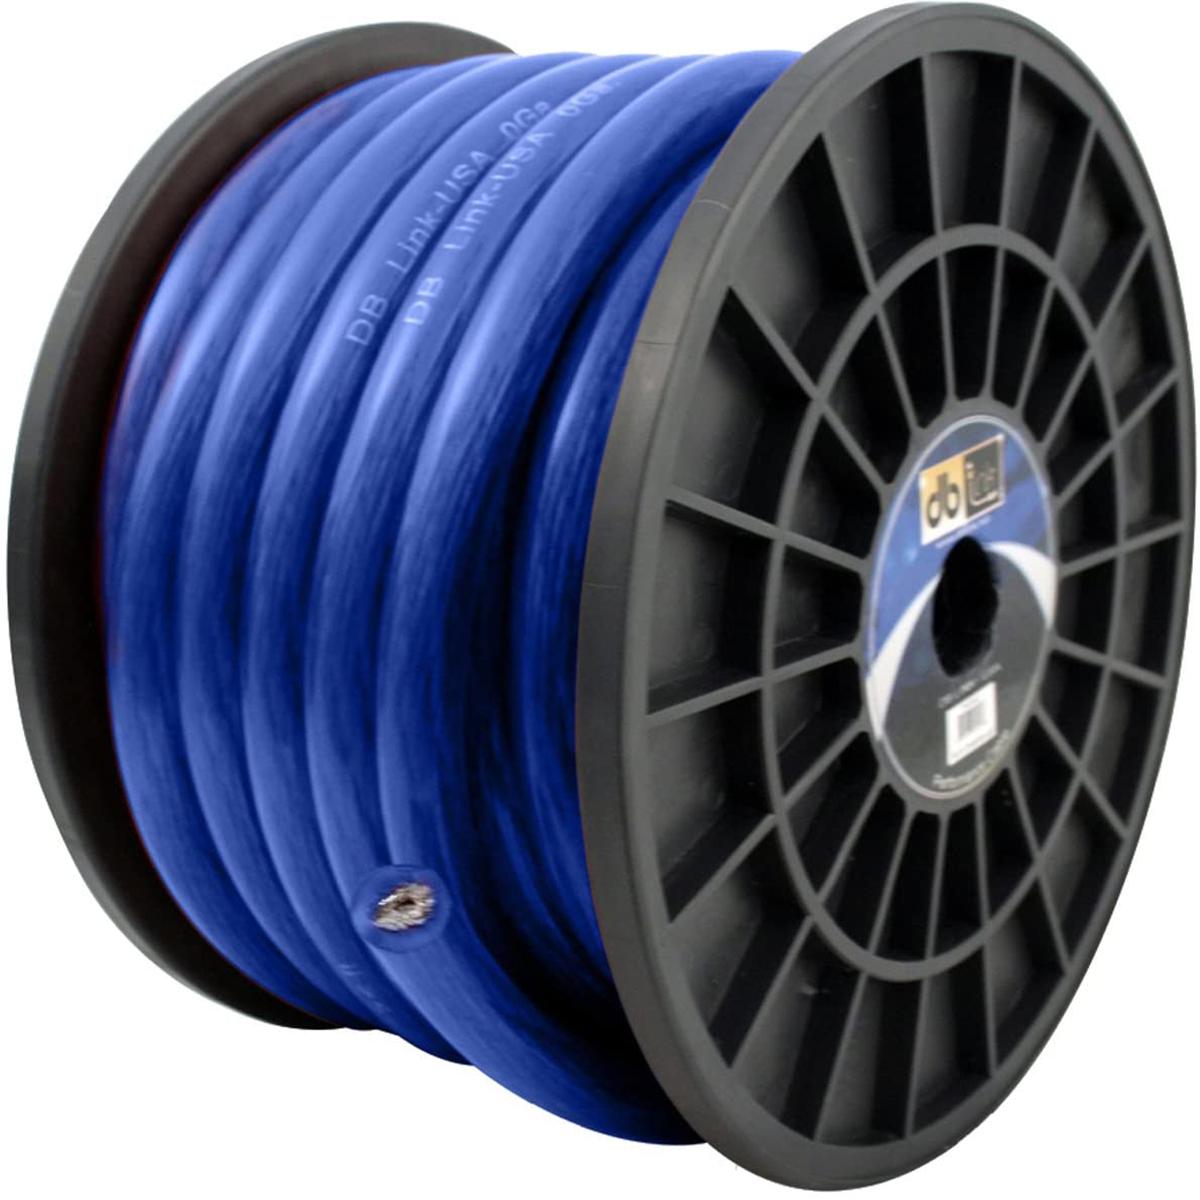 0GA BLUE 50 FT POWER WIRE ROLL